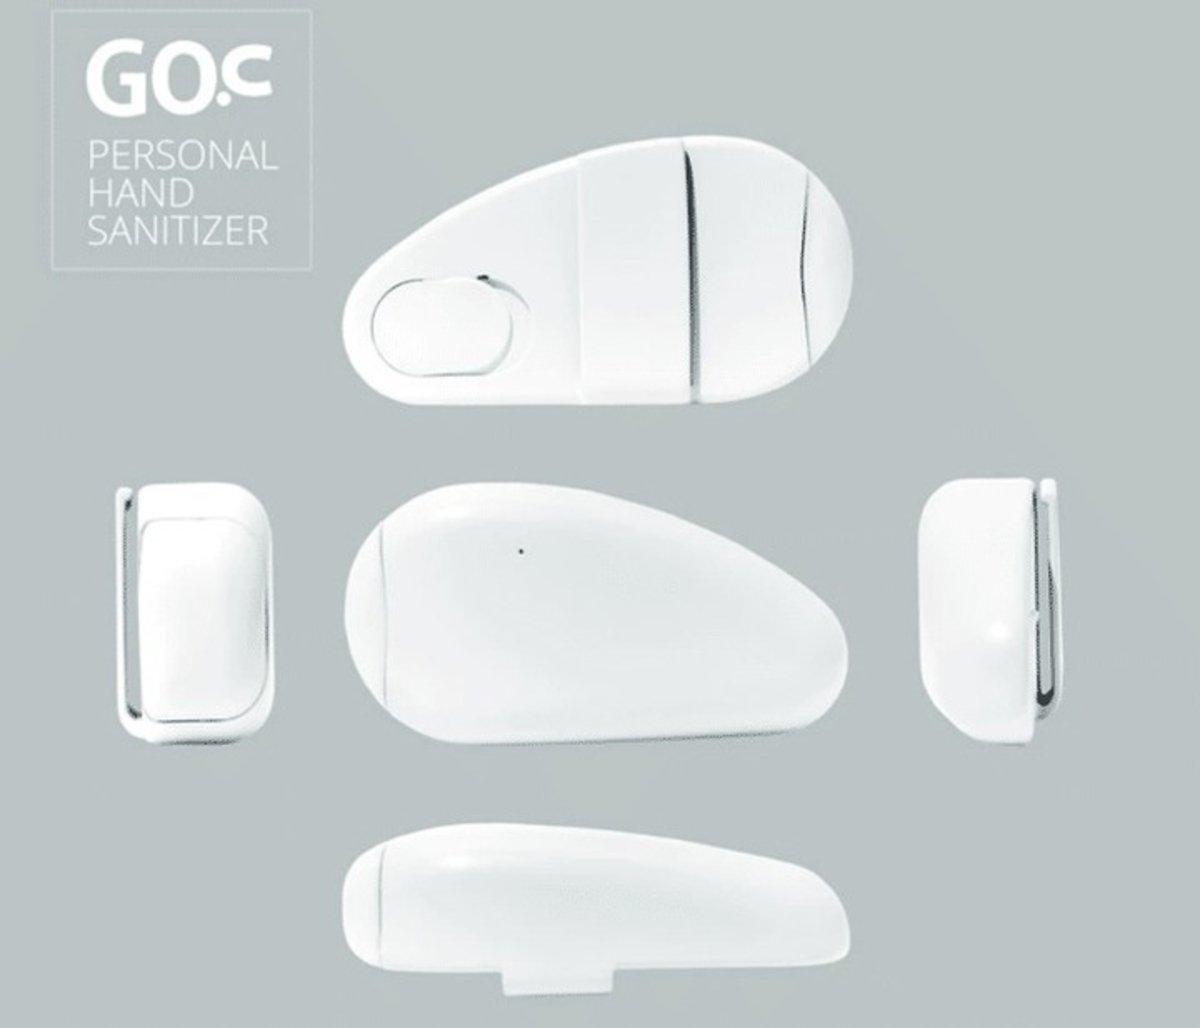 Crean un desinfectante de manos portátil para evitar contagiarse de Covid-19